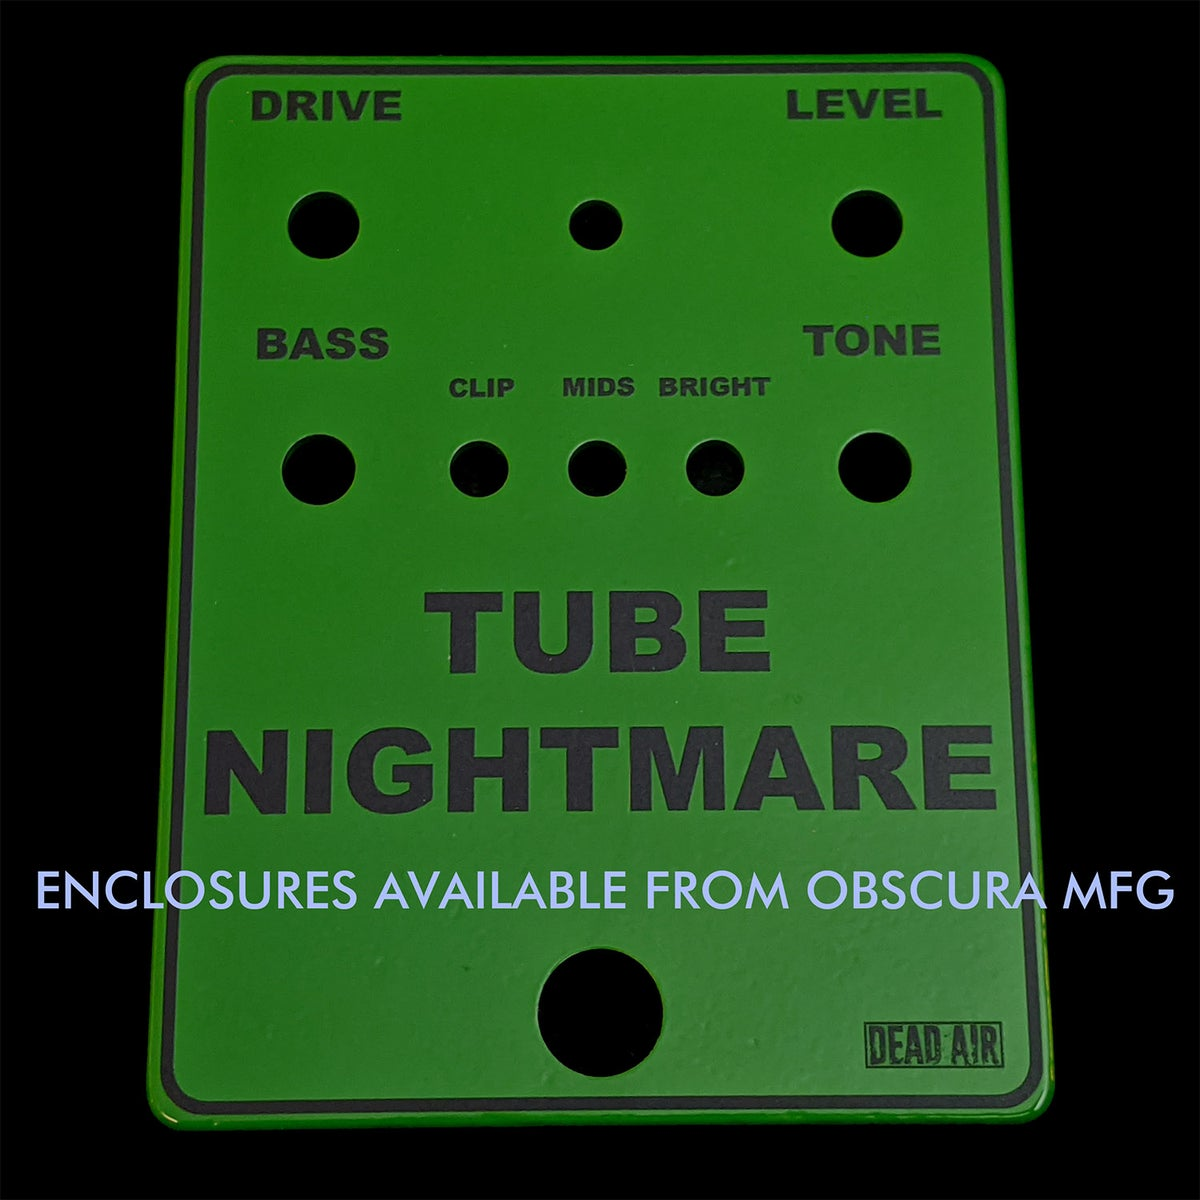 Image of TUBE NIGHTMARE PCB